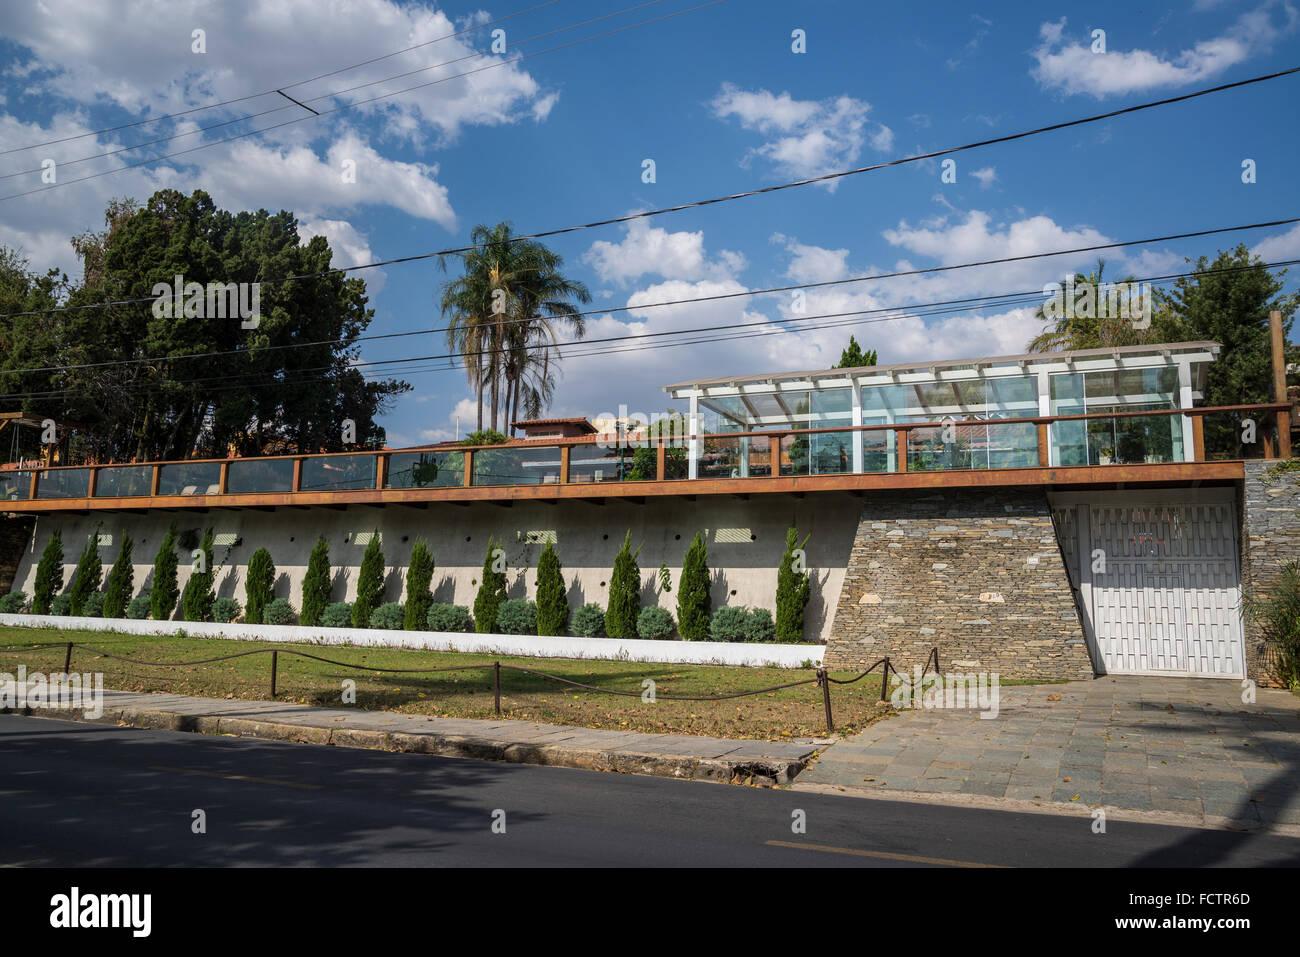 Wealthy residential property, Pampulha, Belo Horizonte, Minas Gerais, Brazil - Stock Image